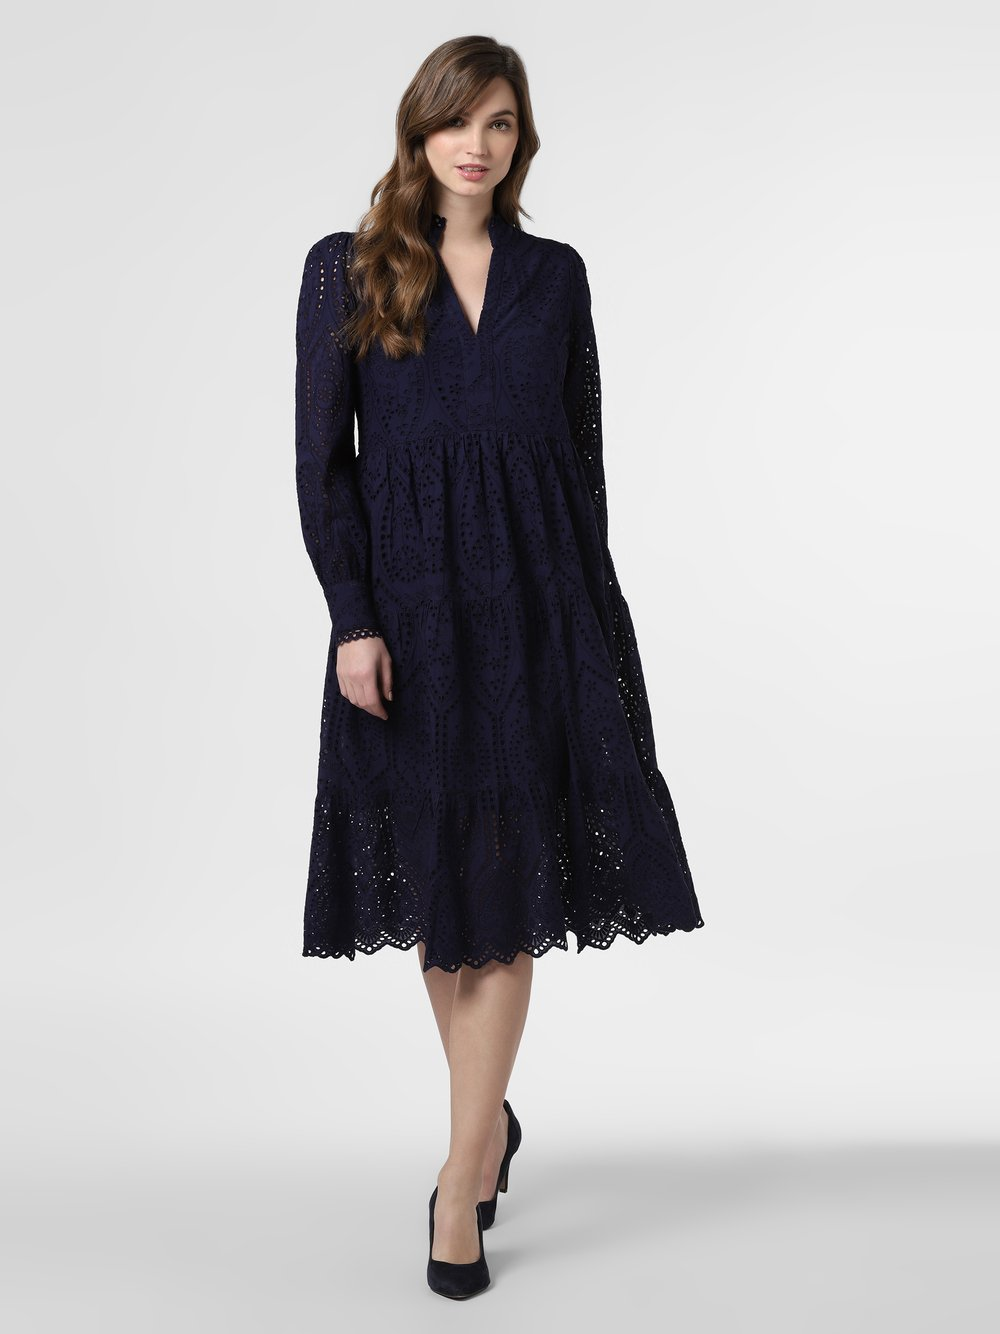 Y.A.S - Sukienka damska – Yasholi, niebieski